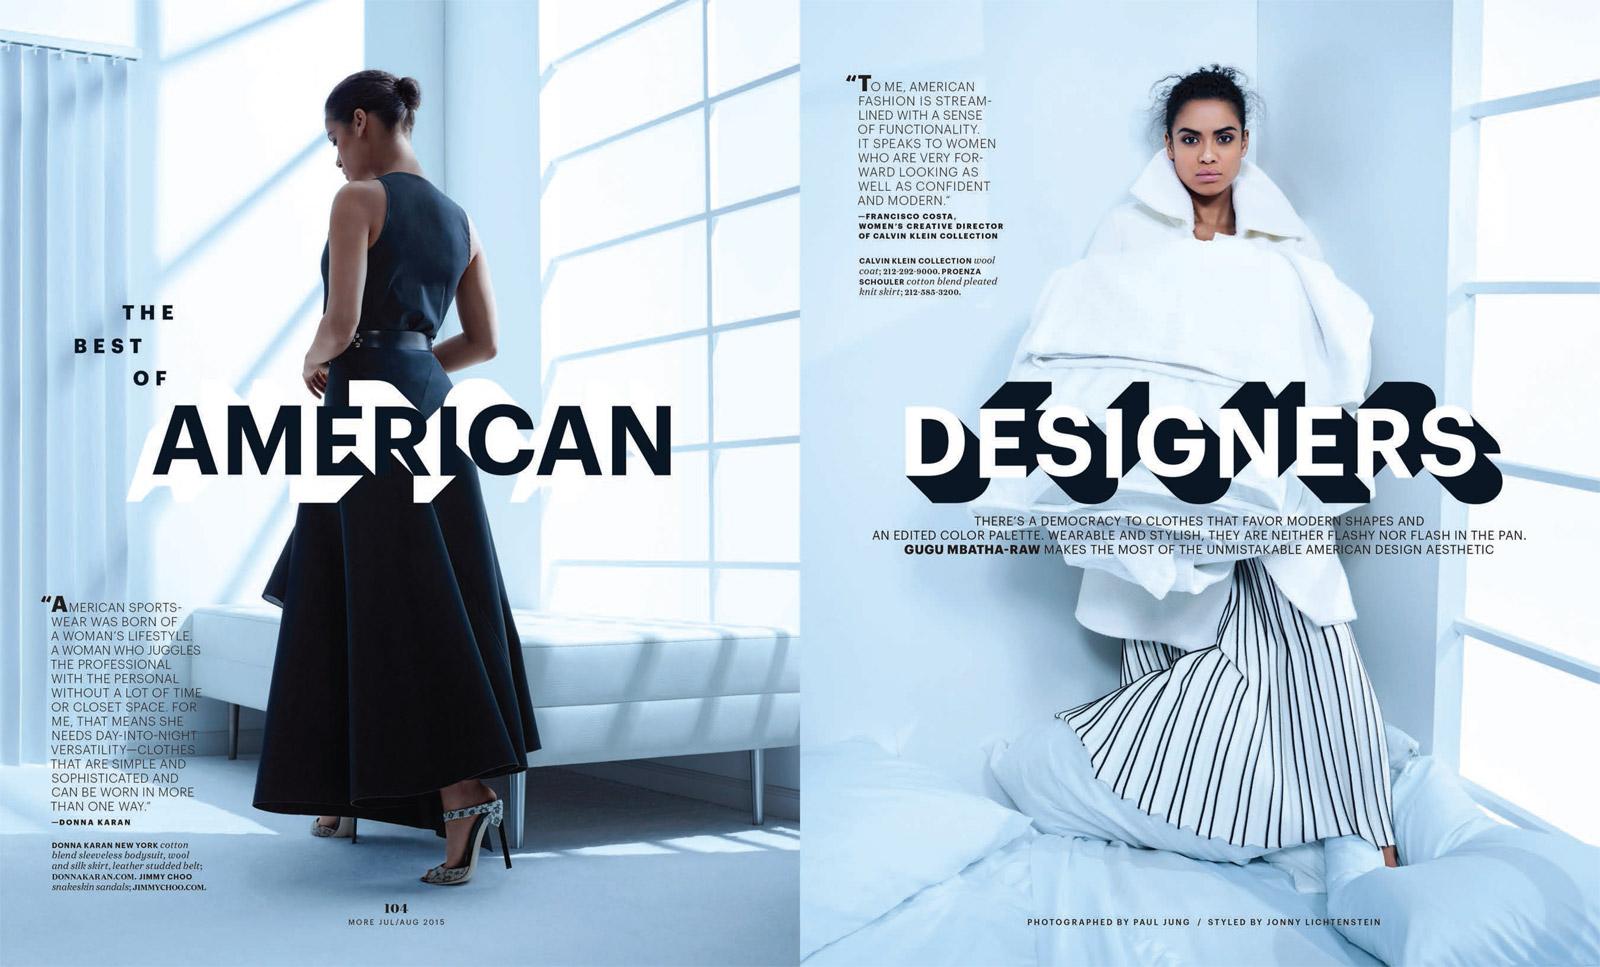 MORE-July2015-American-Designers-1.jpg